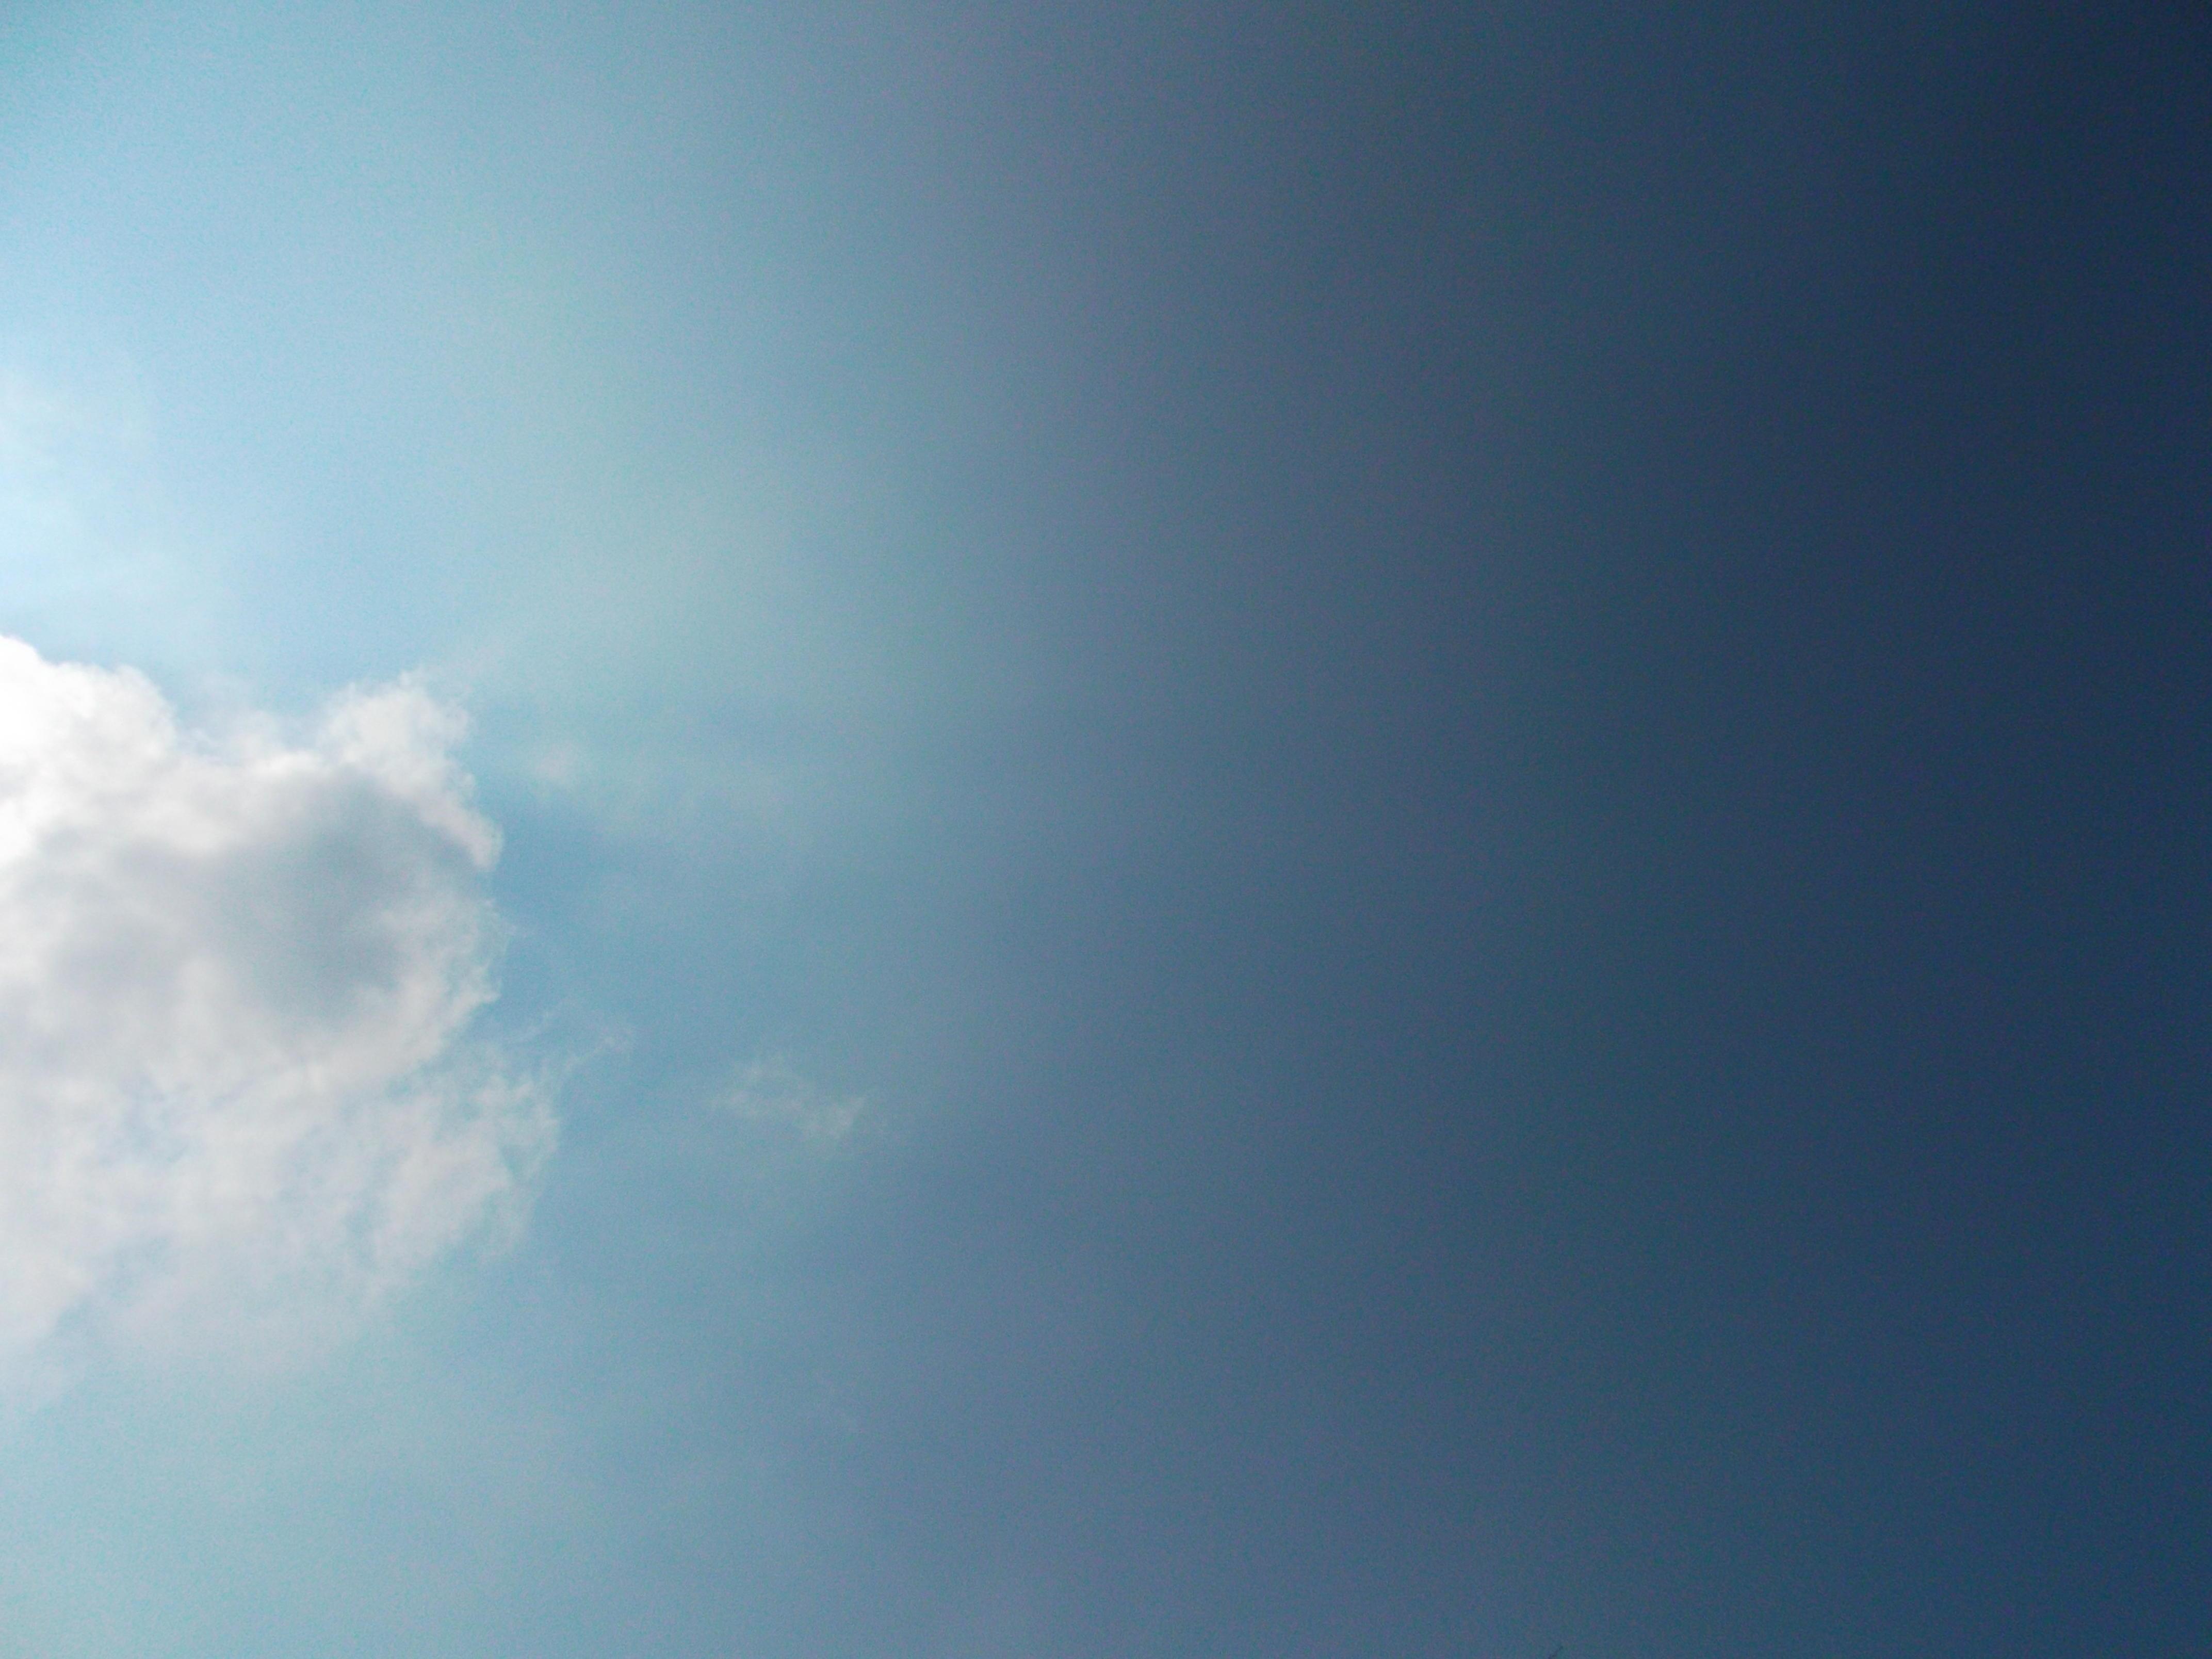 2013-04-03 Longitude -0.371 Latitude 49.182 Altitude 29 Heure 13h20